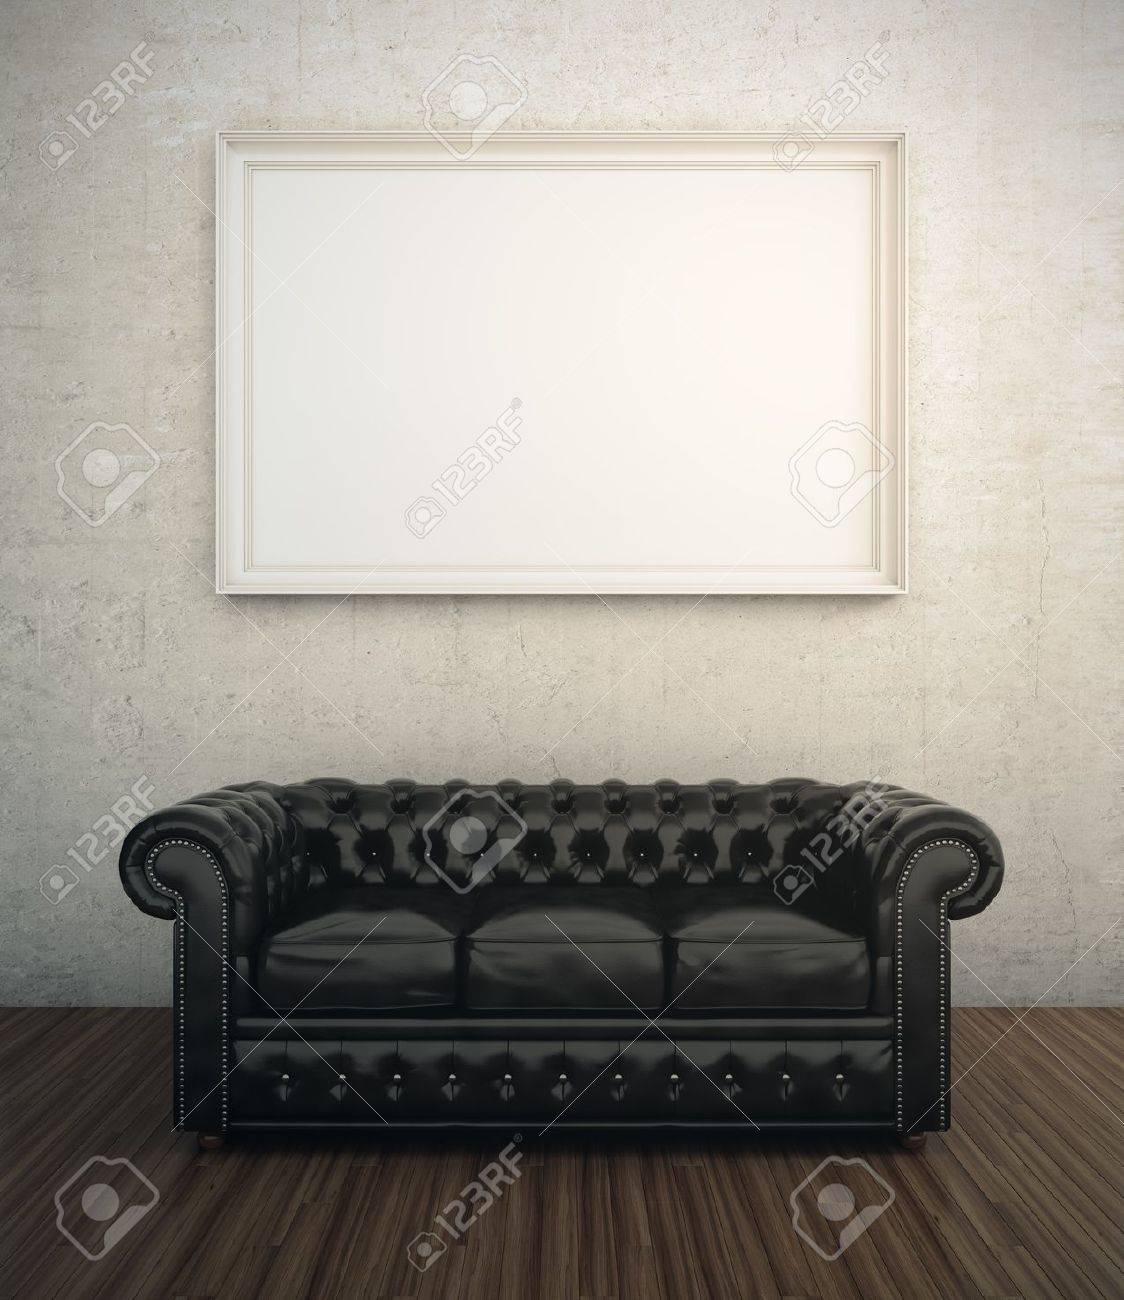 Black leather sofa next to white wall with blank frame Stock Photo - 21523104